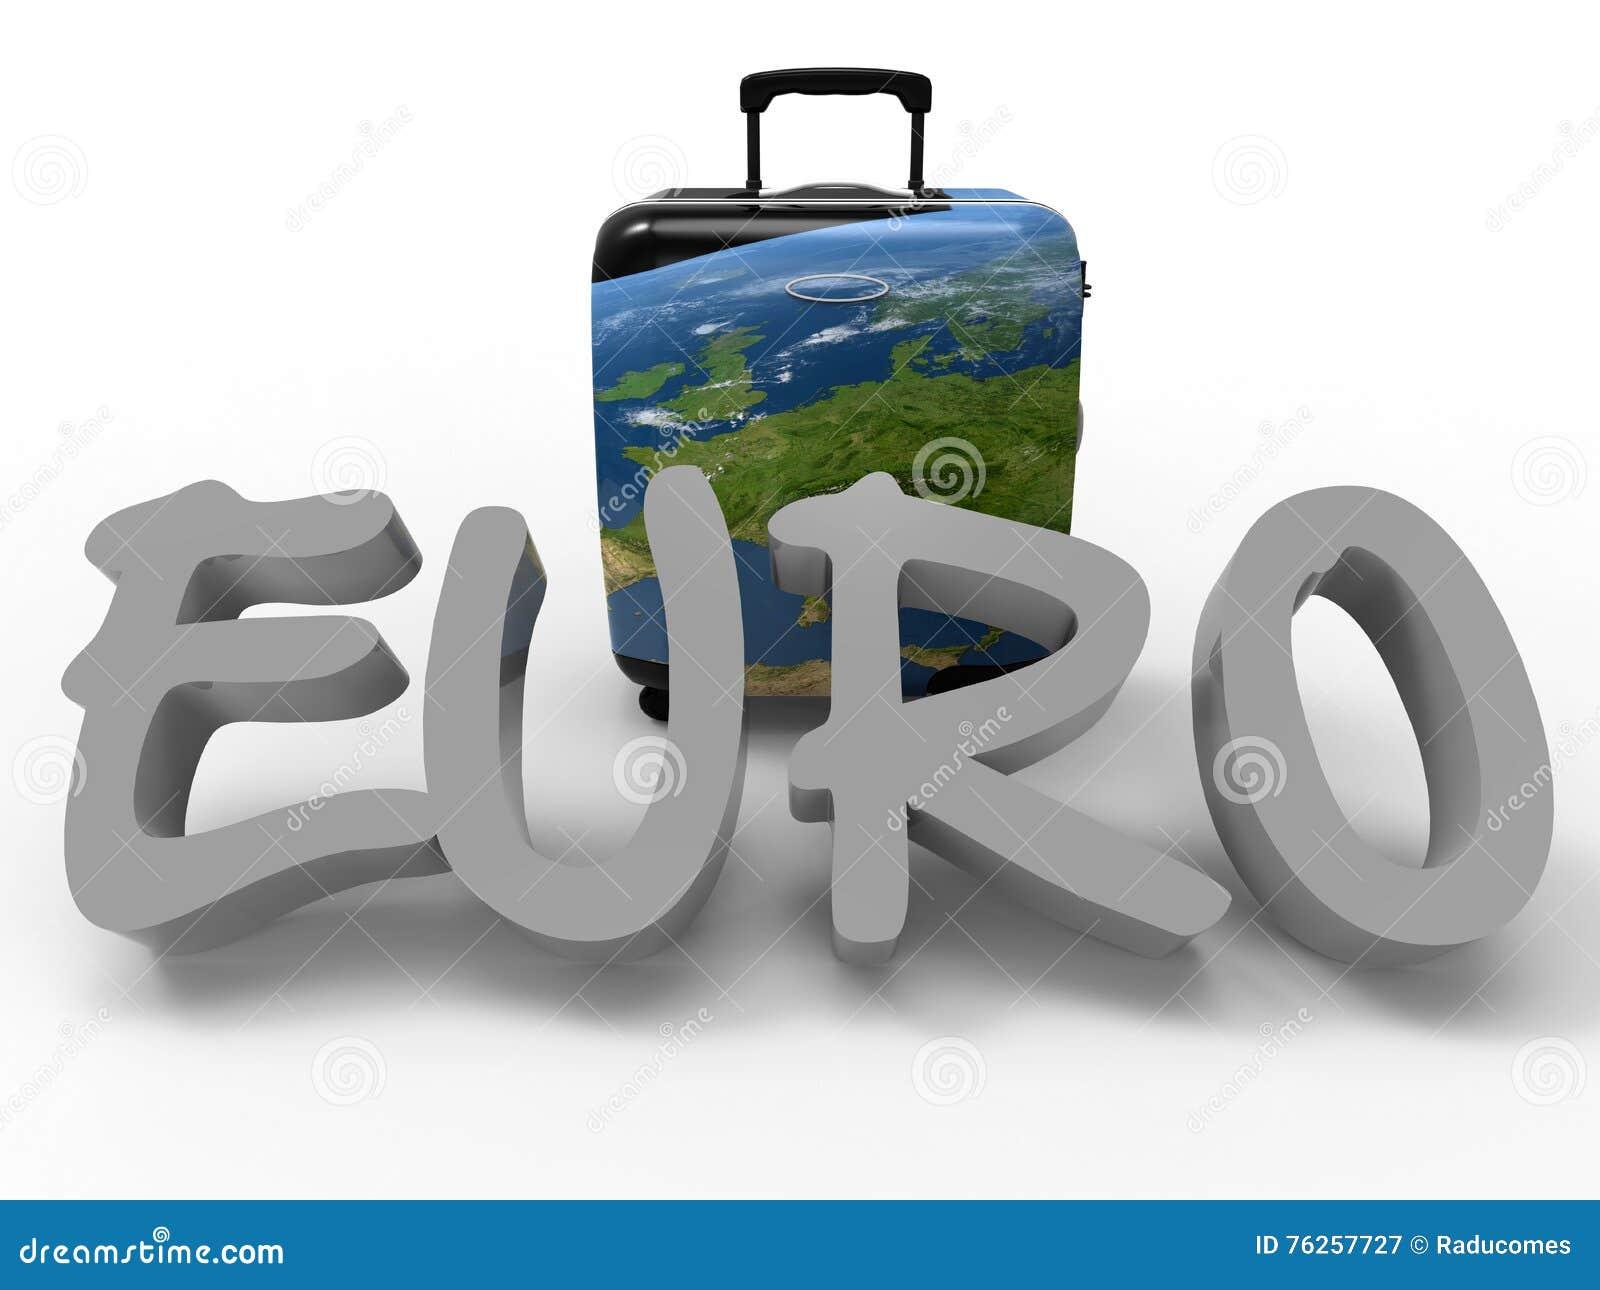 eurotrip movie free download